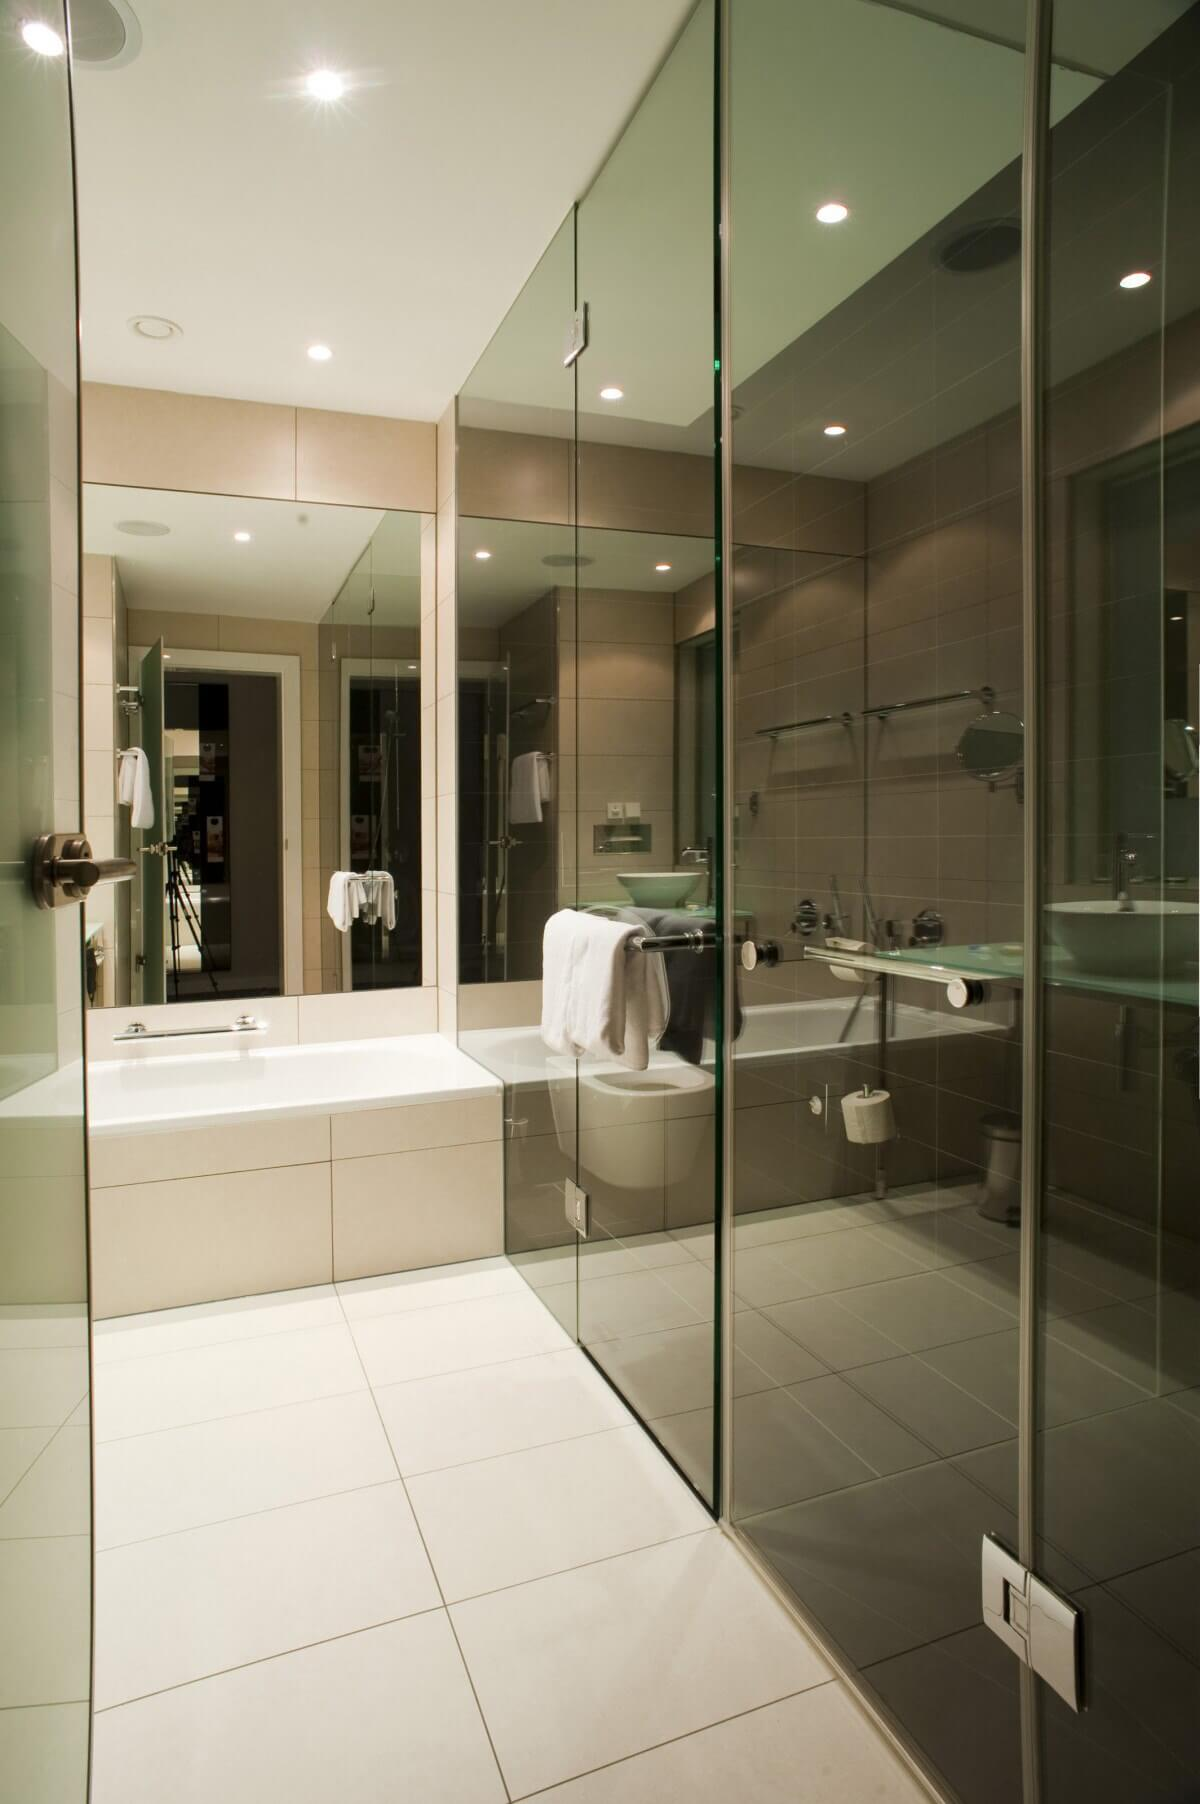 Interior of a modern residential bathroom